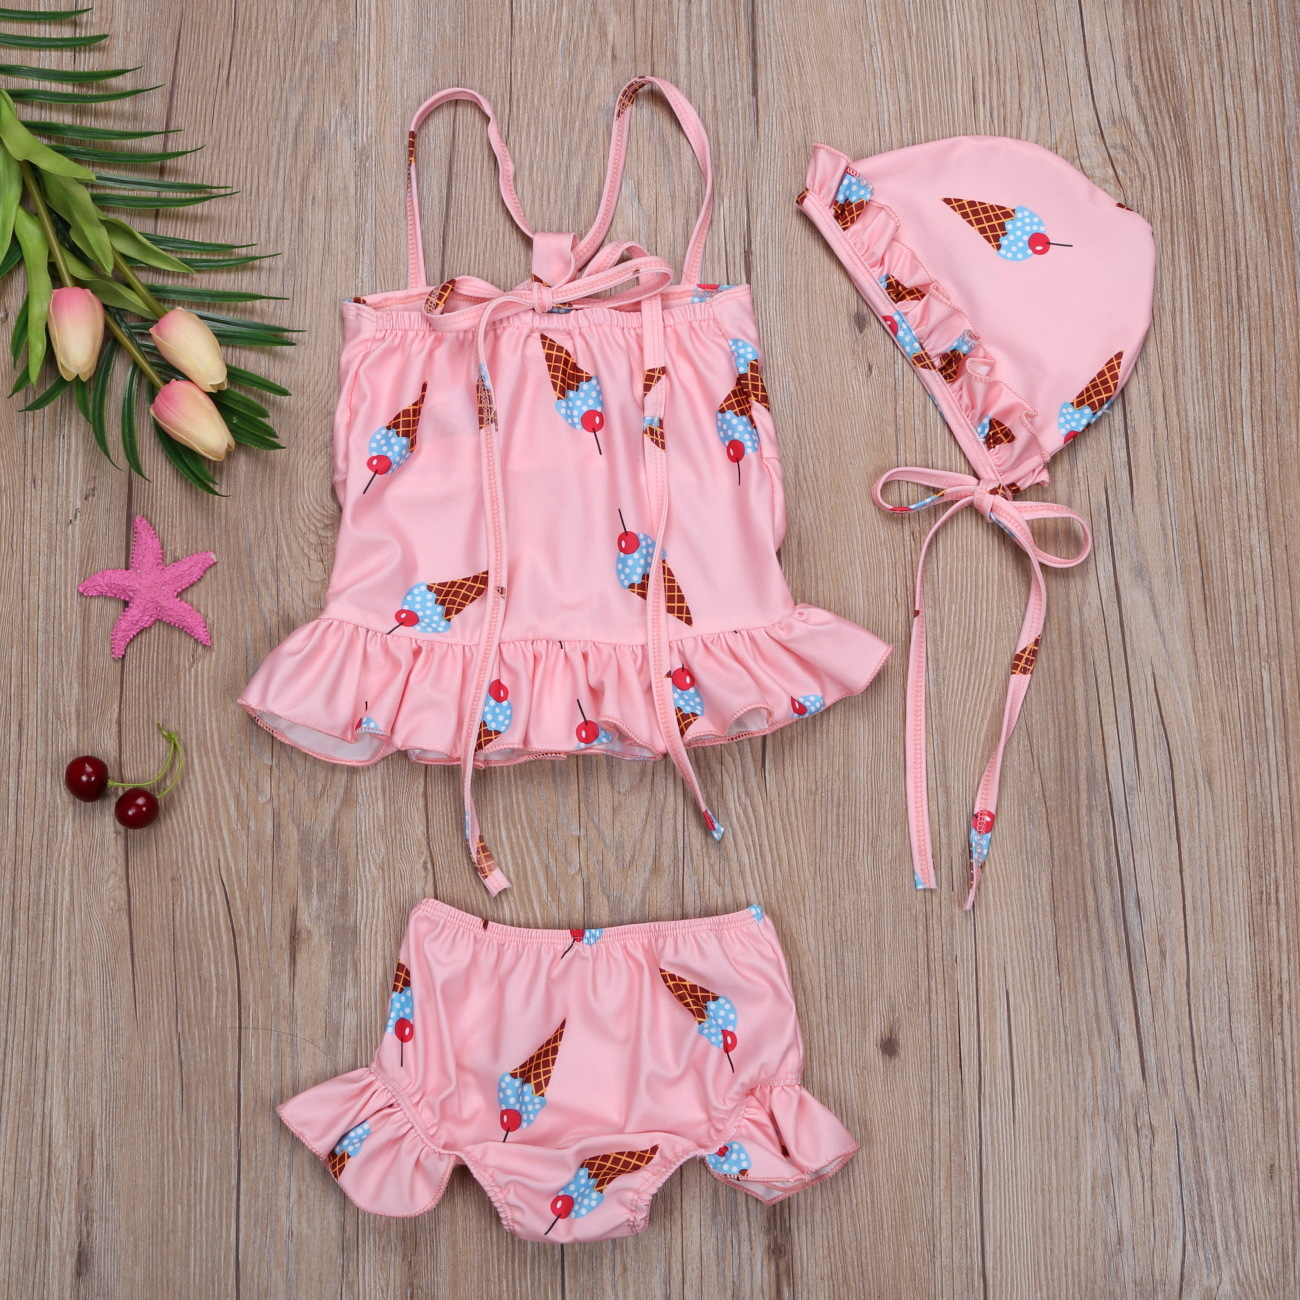 Summer Girls Cartoon Ice Cream Printed Dungaree Shirt Shorts Hat Three-piece Set Children's Swimsuit Set